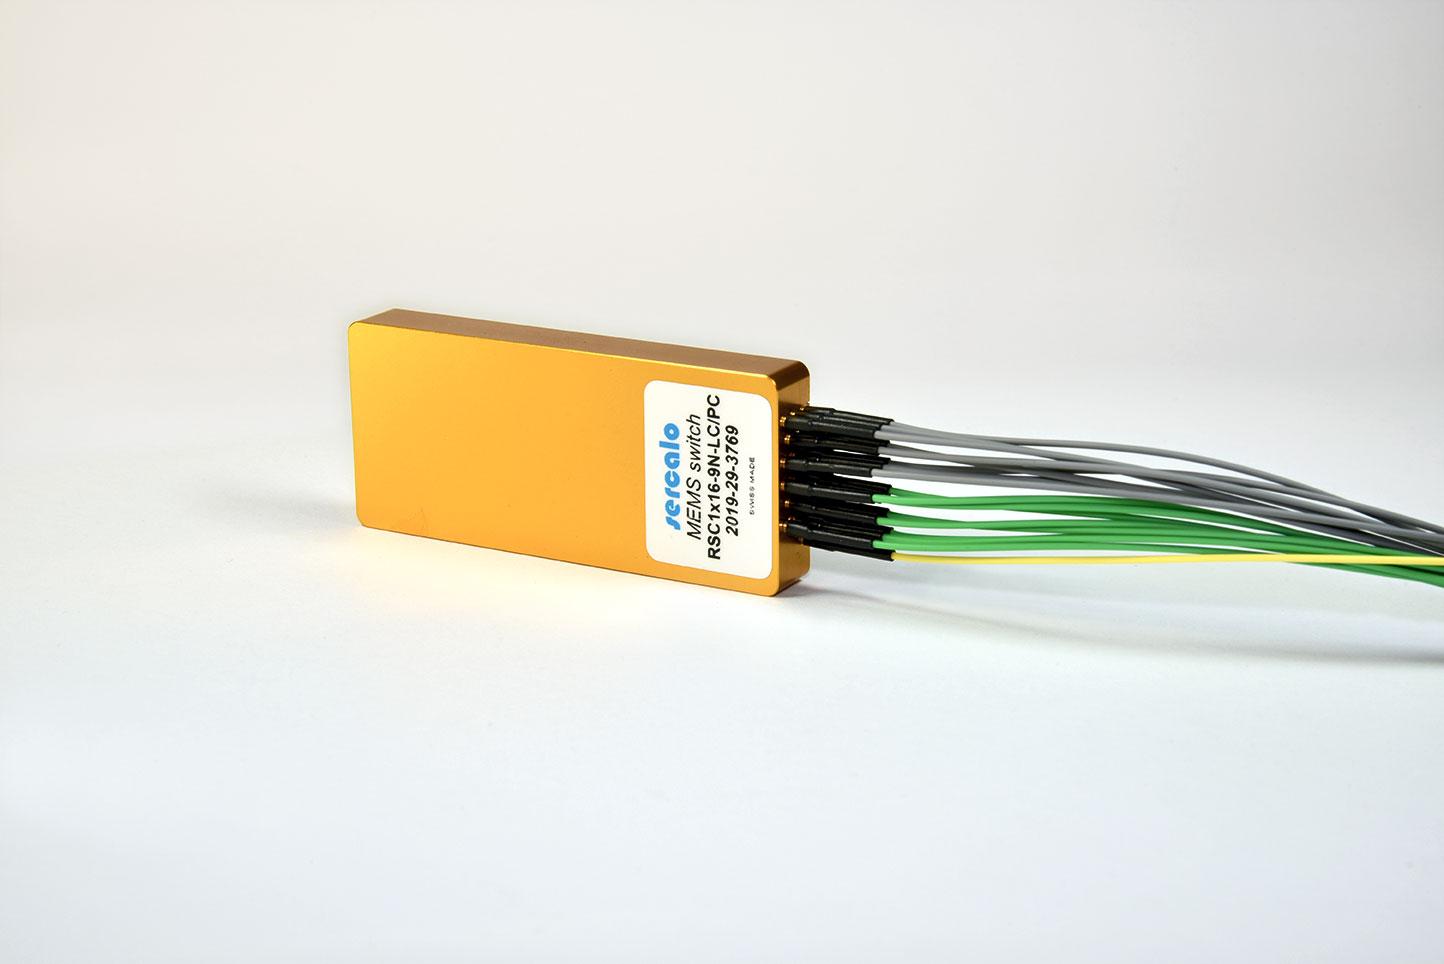 MEMS Switch SW-1x4-9N-FP-PC